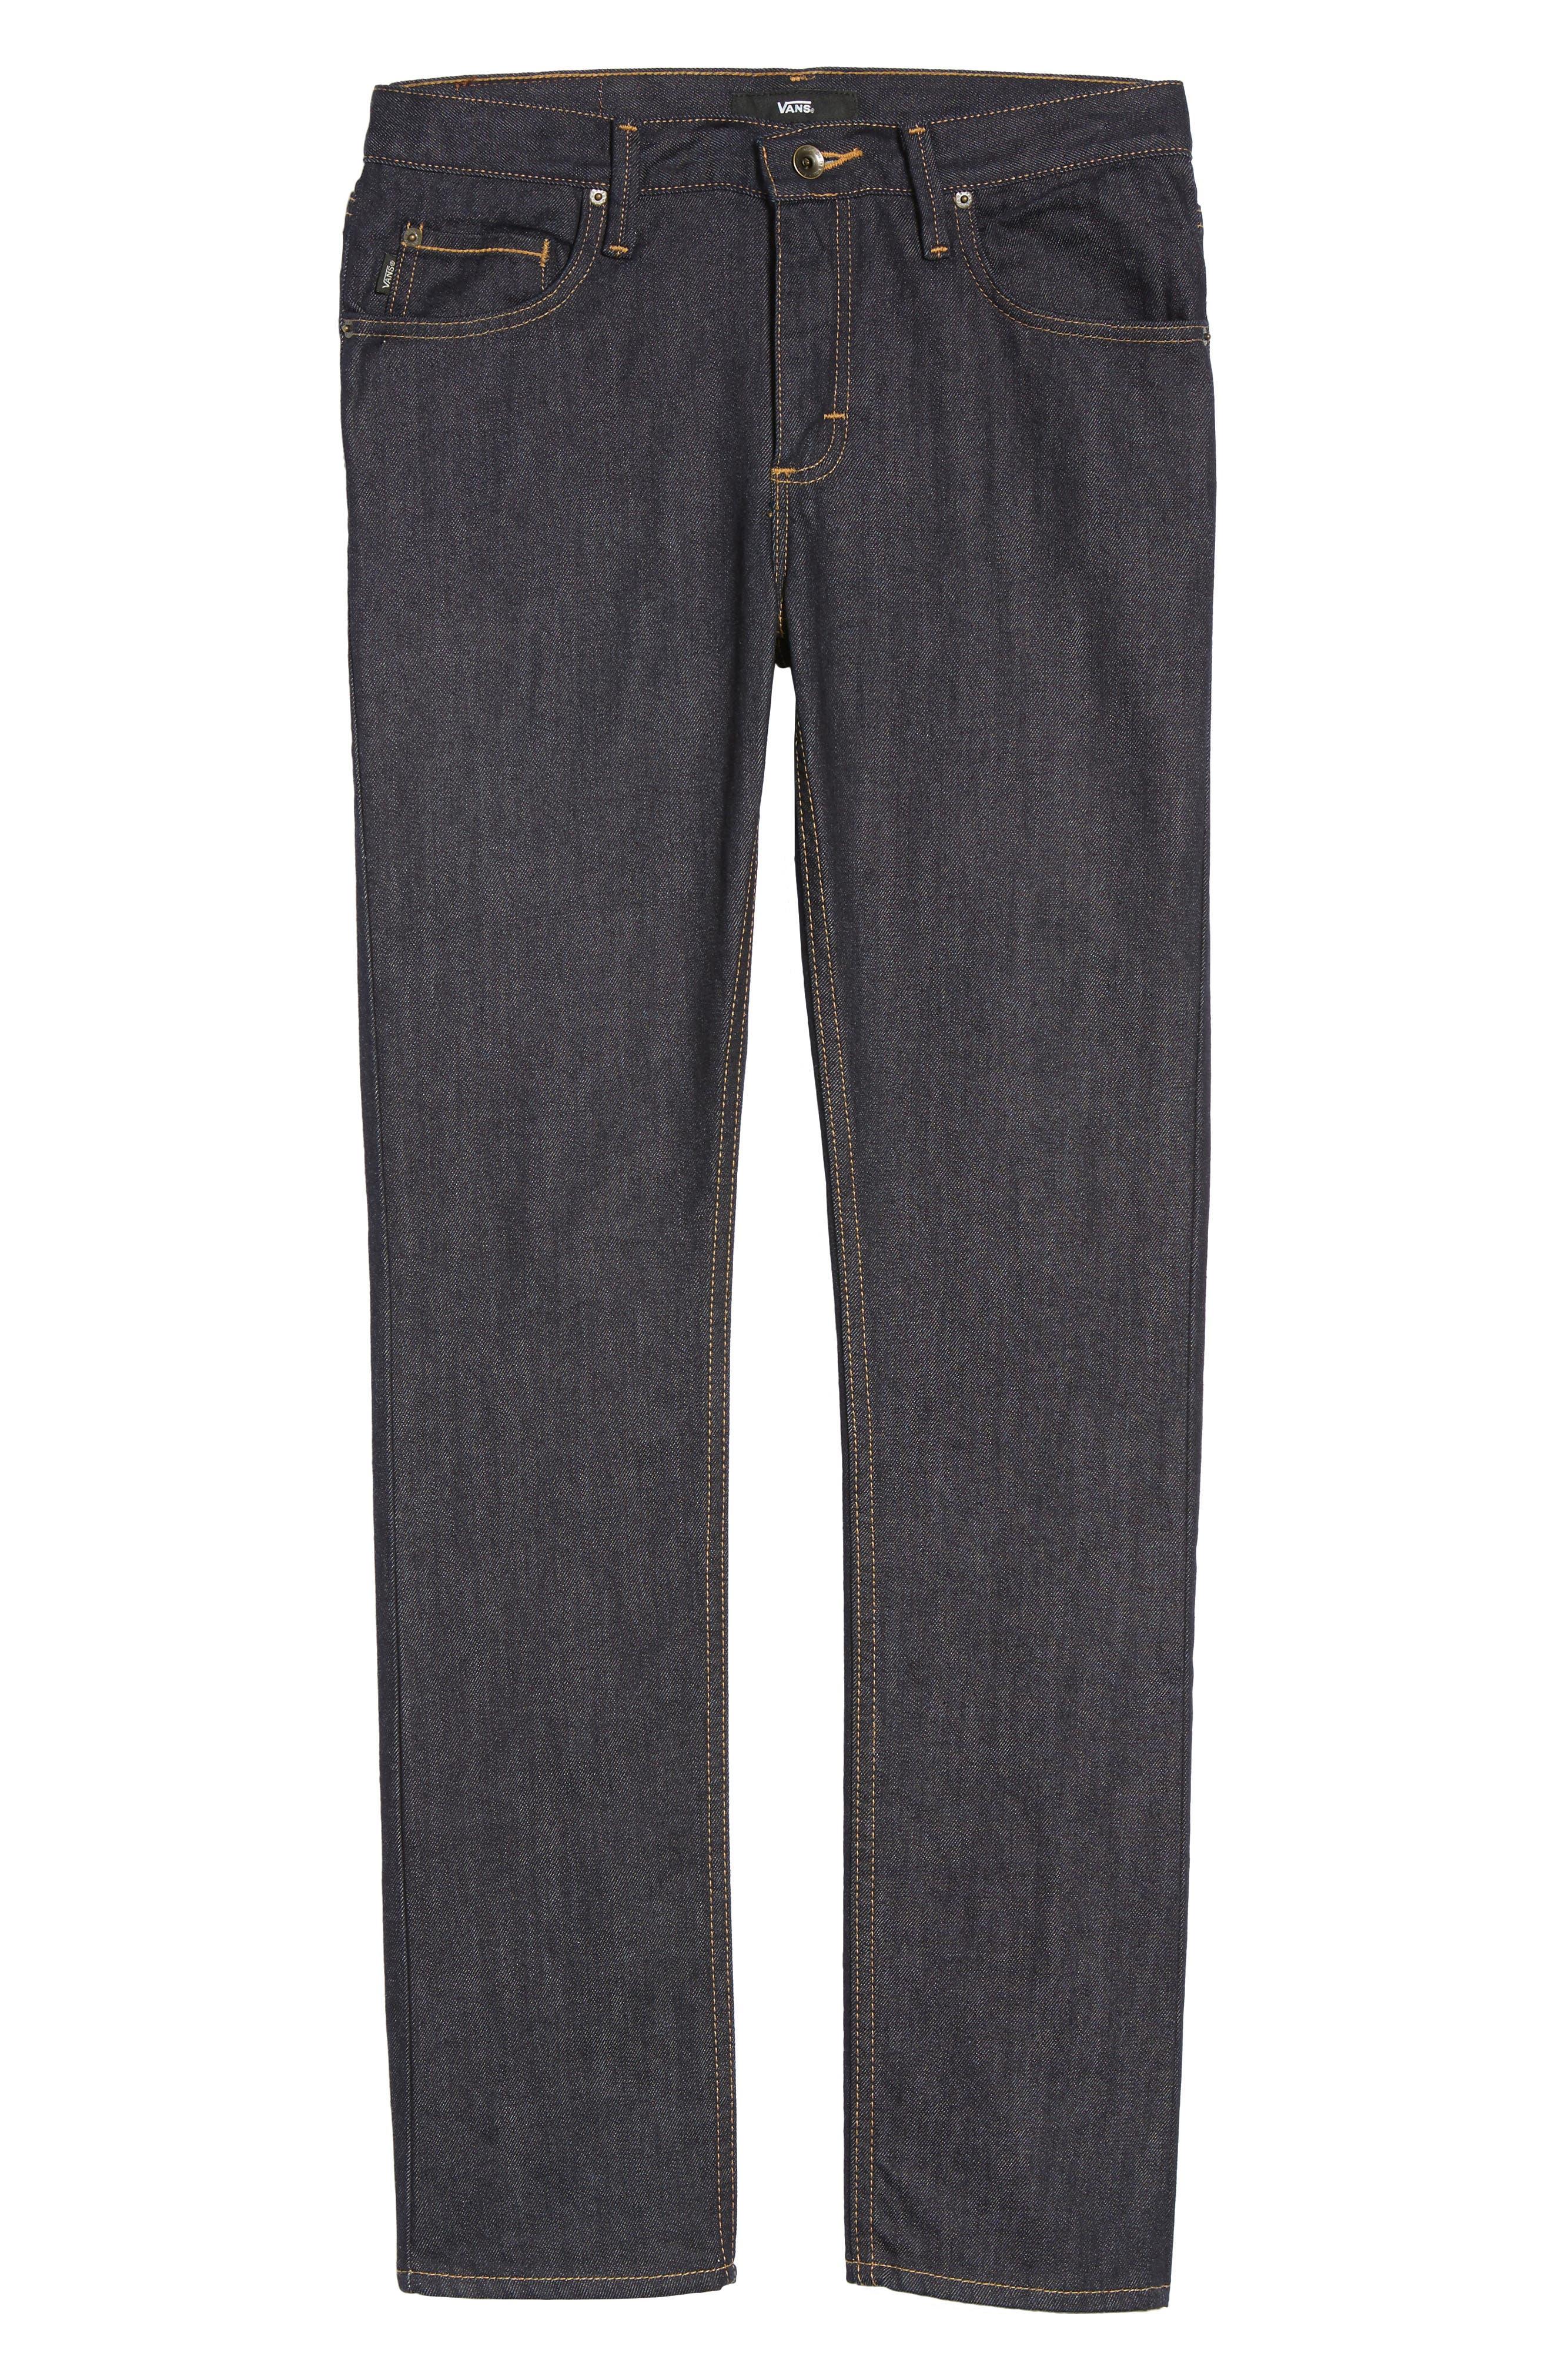 V76 Skinny Jeans,                             Alternate thumbnail 6, color,                             Indigo